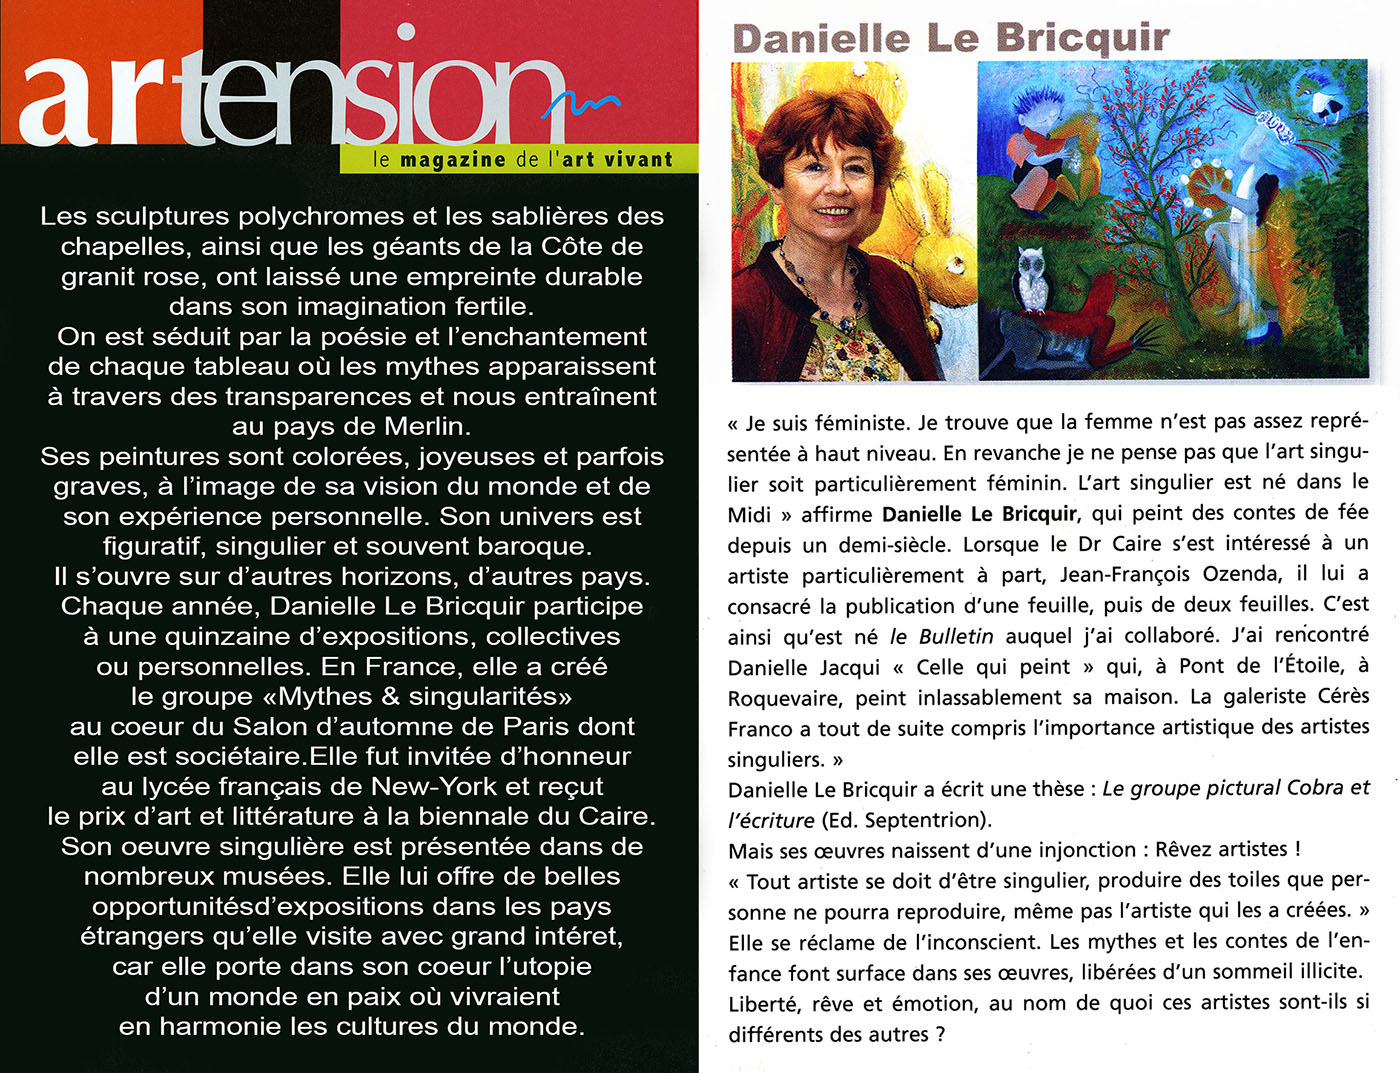 DanielleLeBricquir